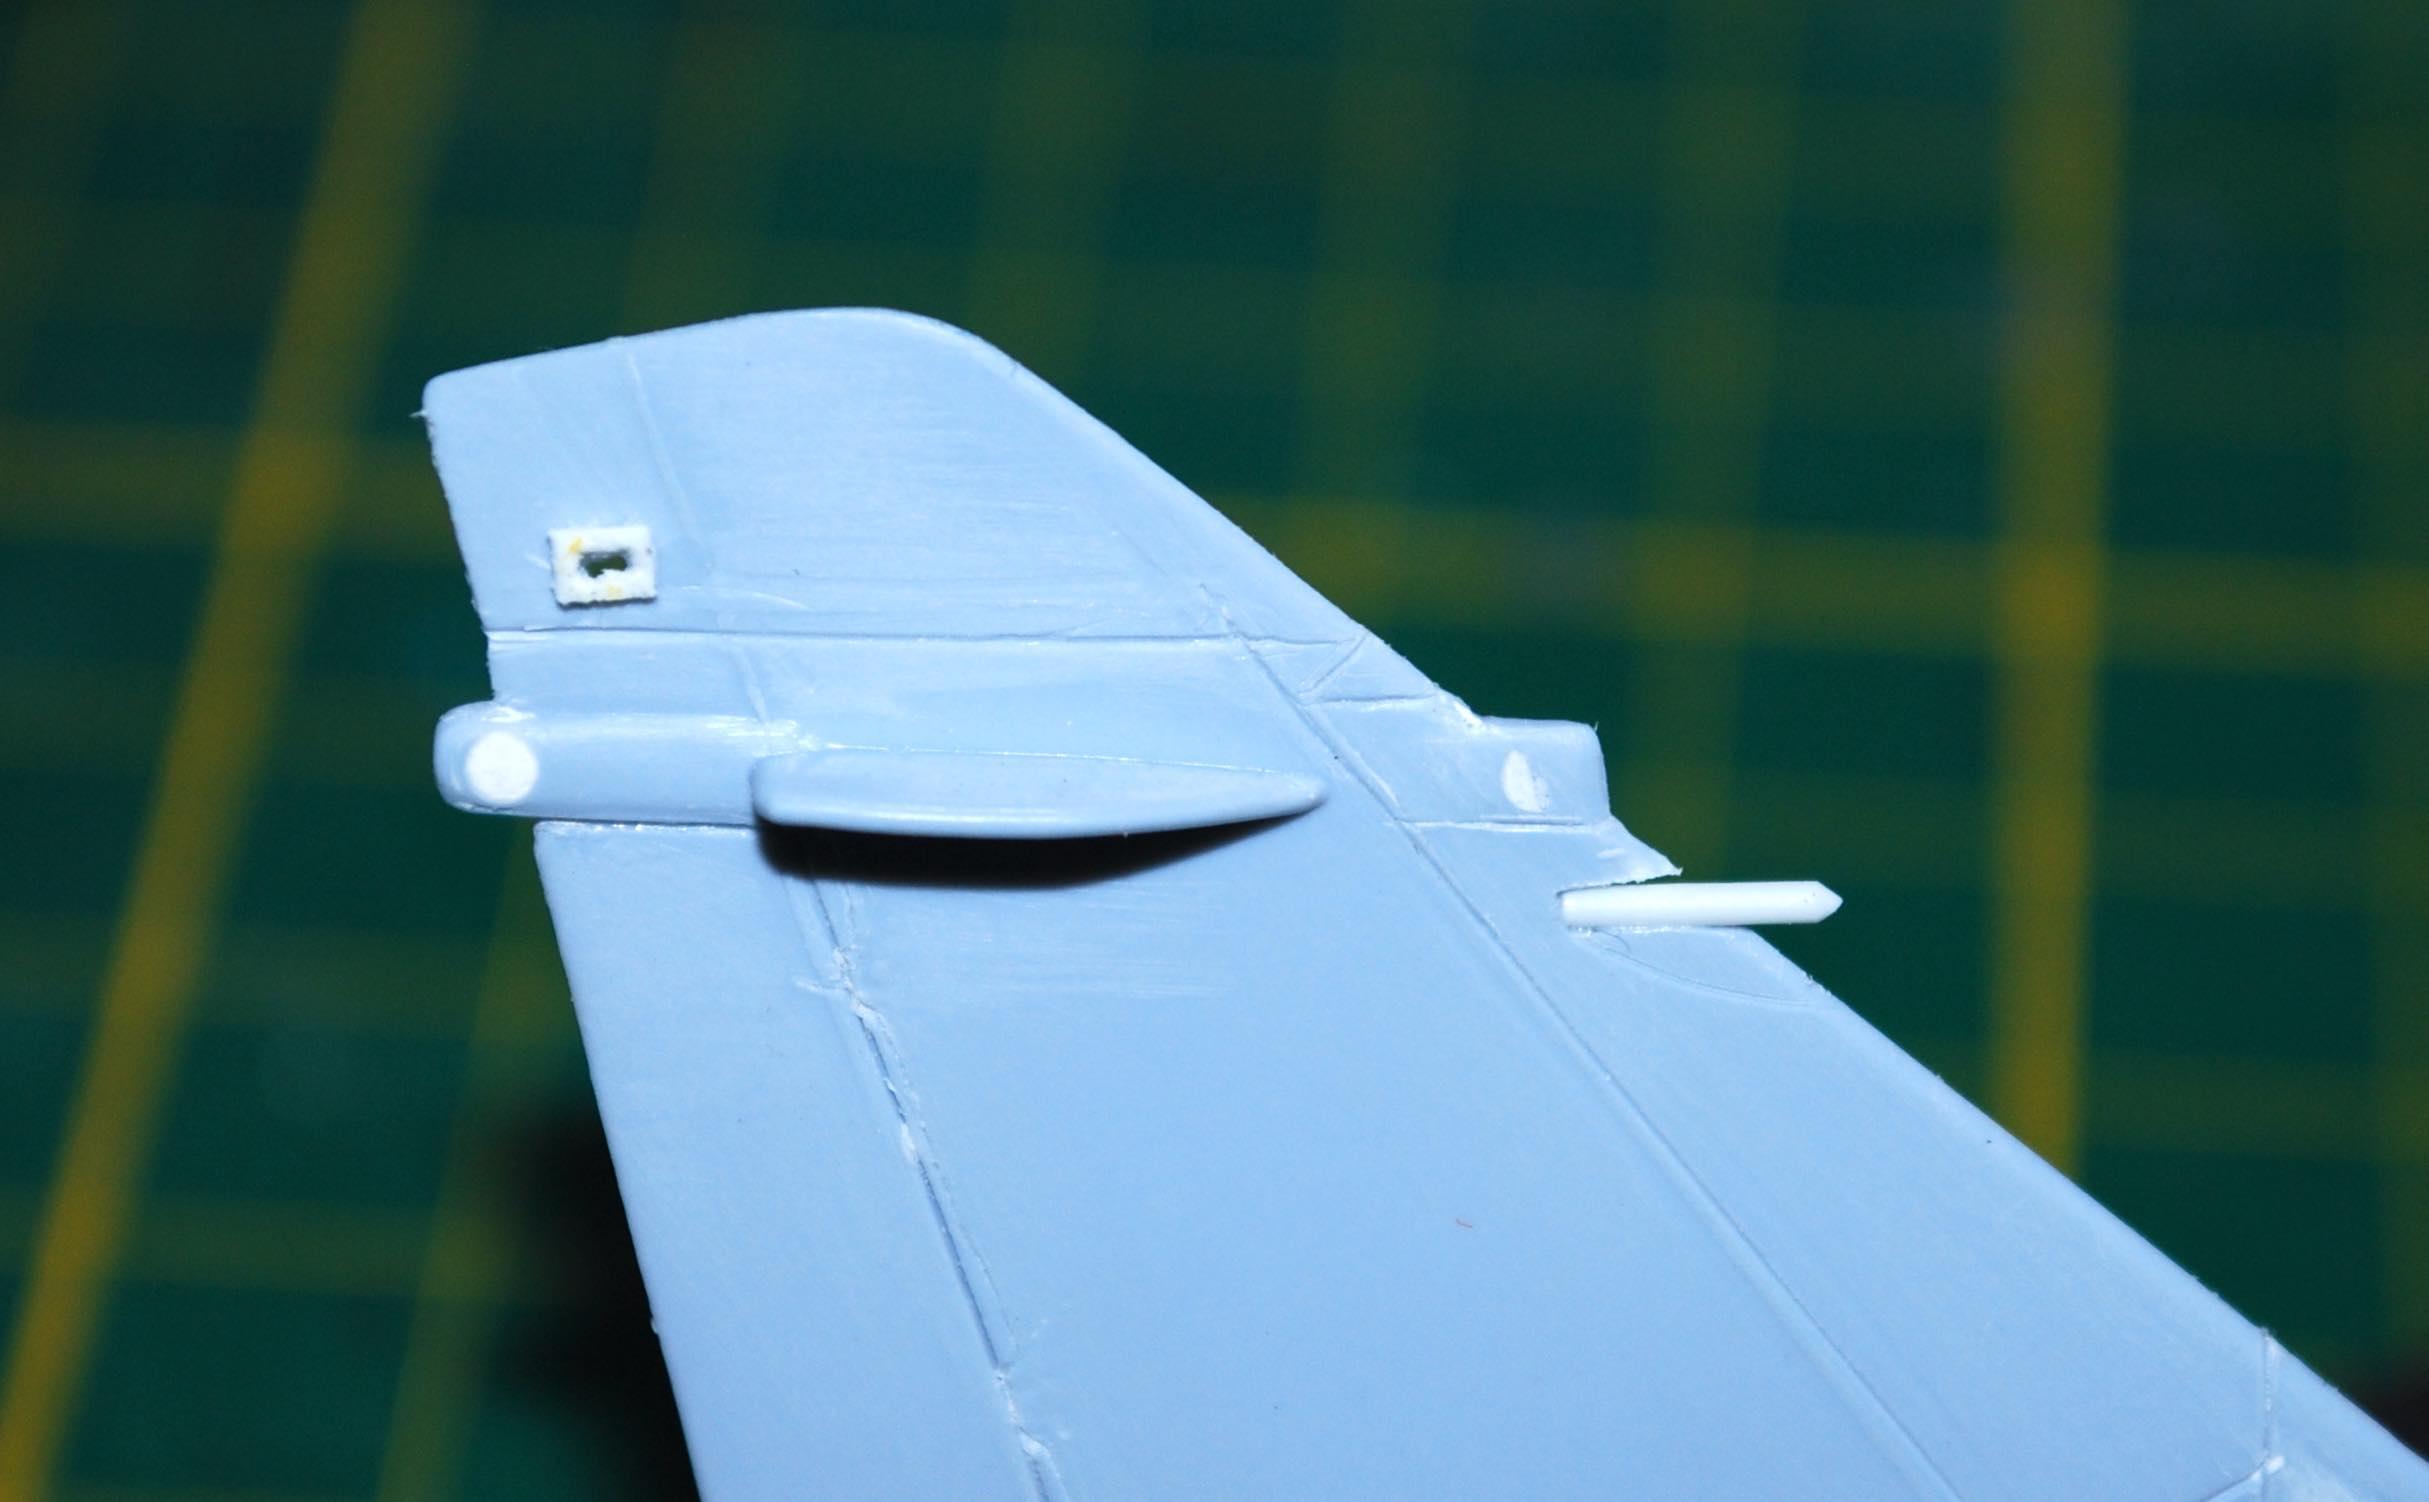 1/72 Mirage 2000-5F (Base 2000C) Heller Dsc_0246